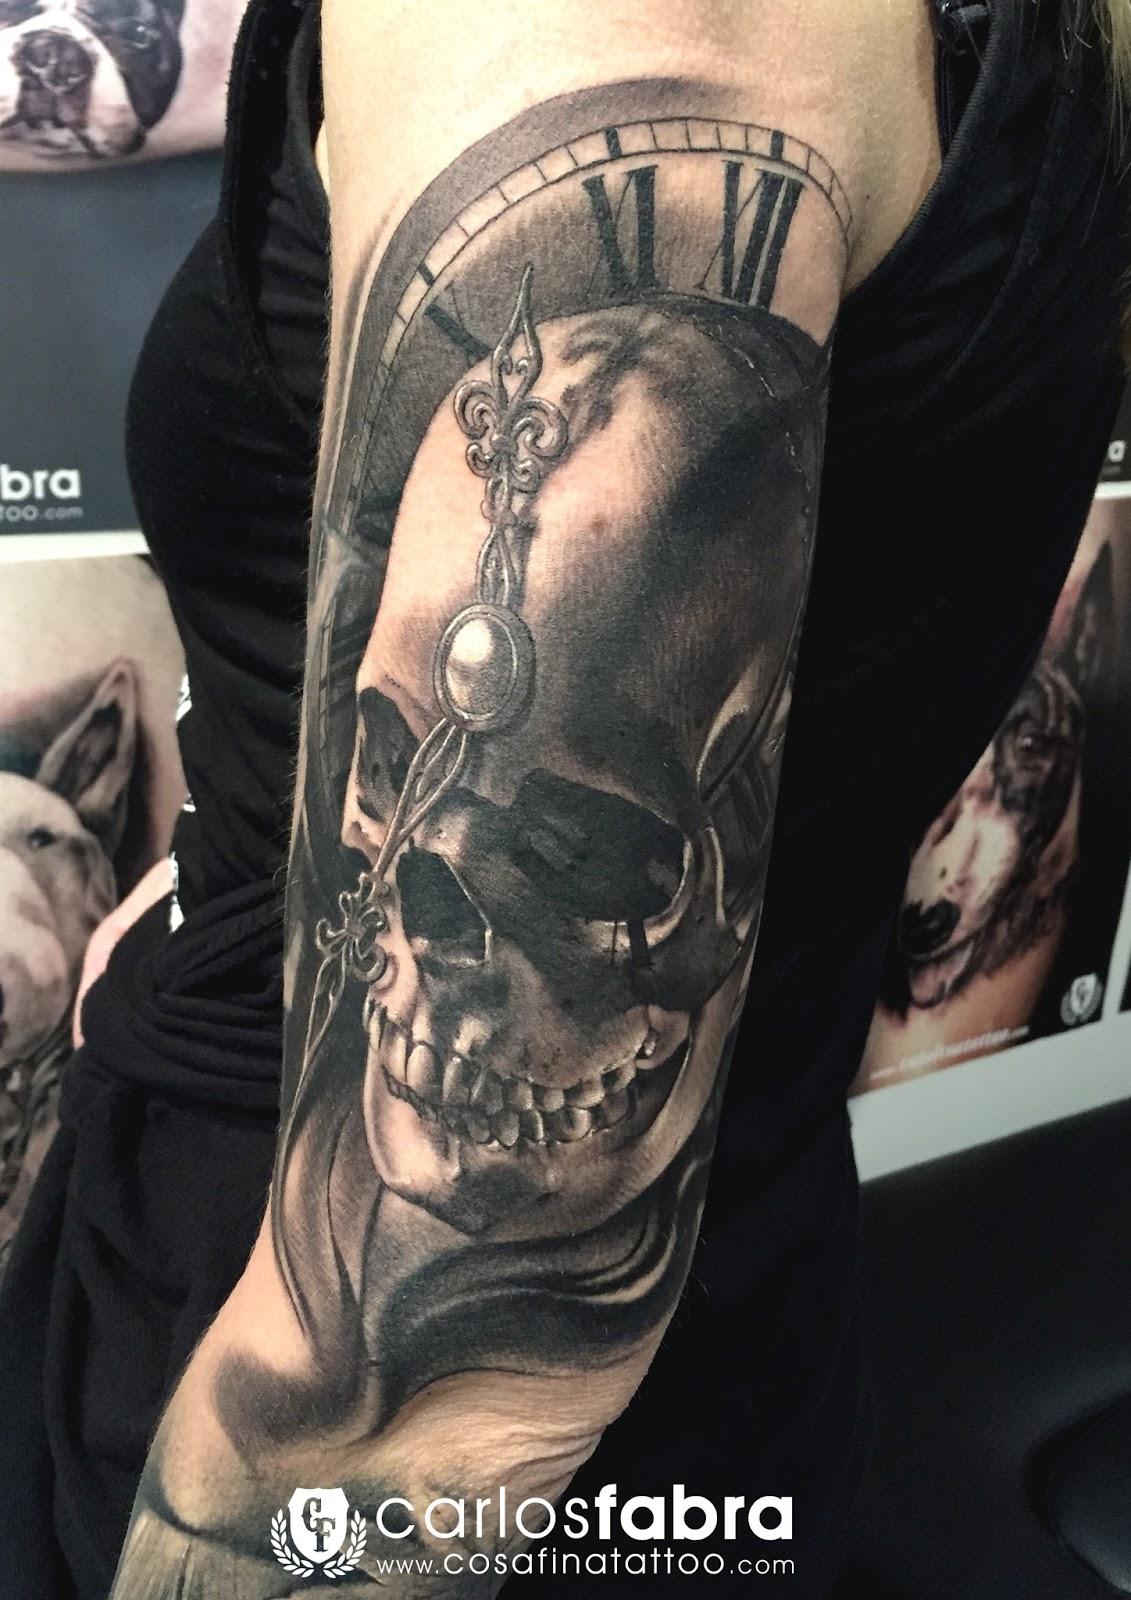 Cosafina Tattoo Carlos Art Studio Tatuaje Calavera Reloj Agujas